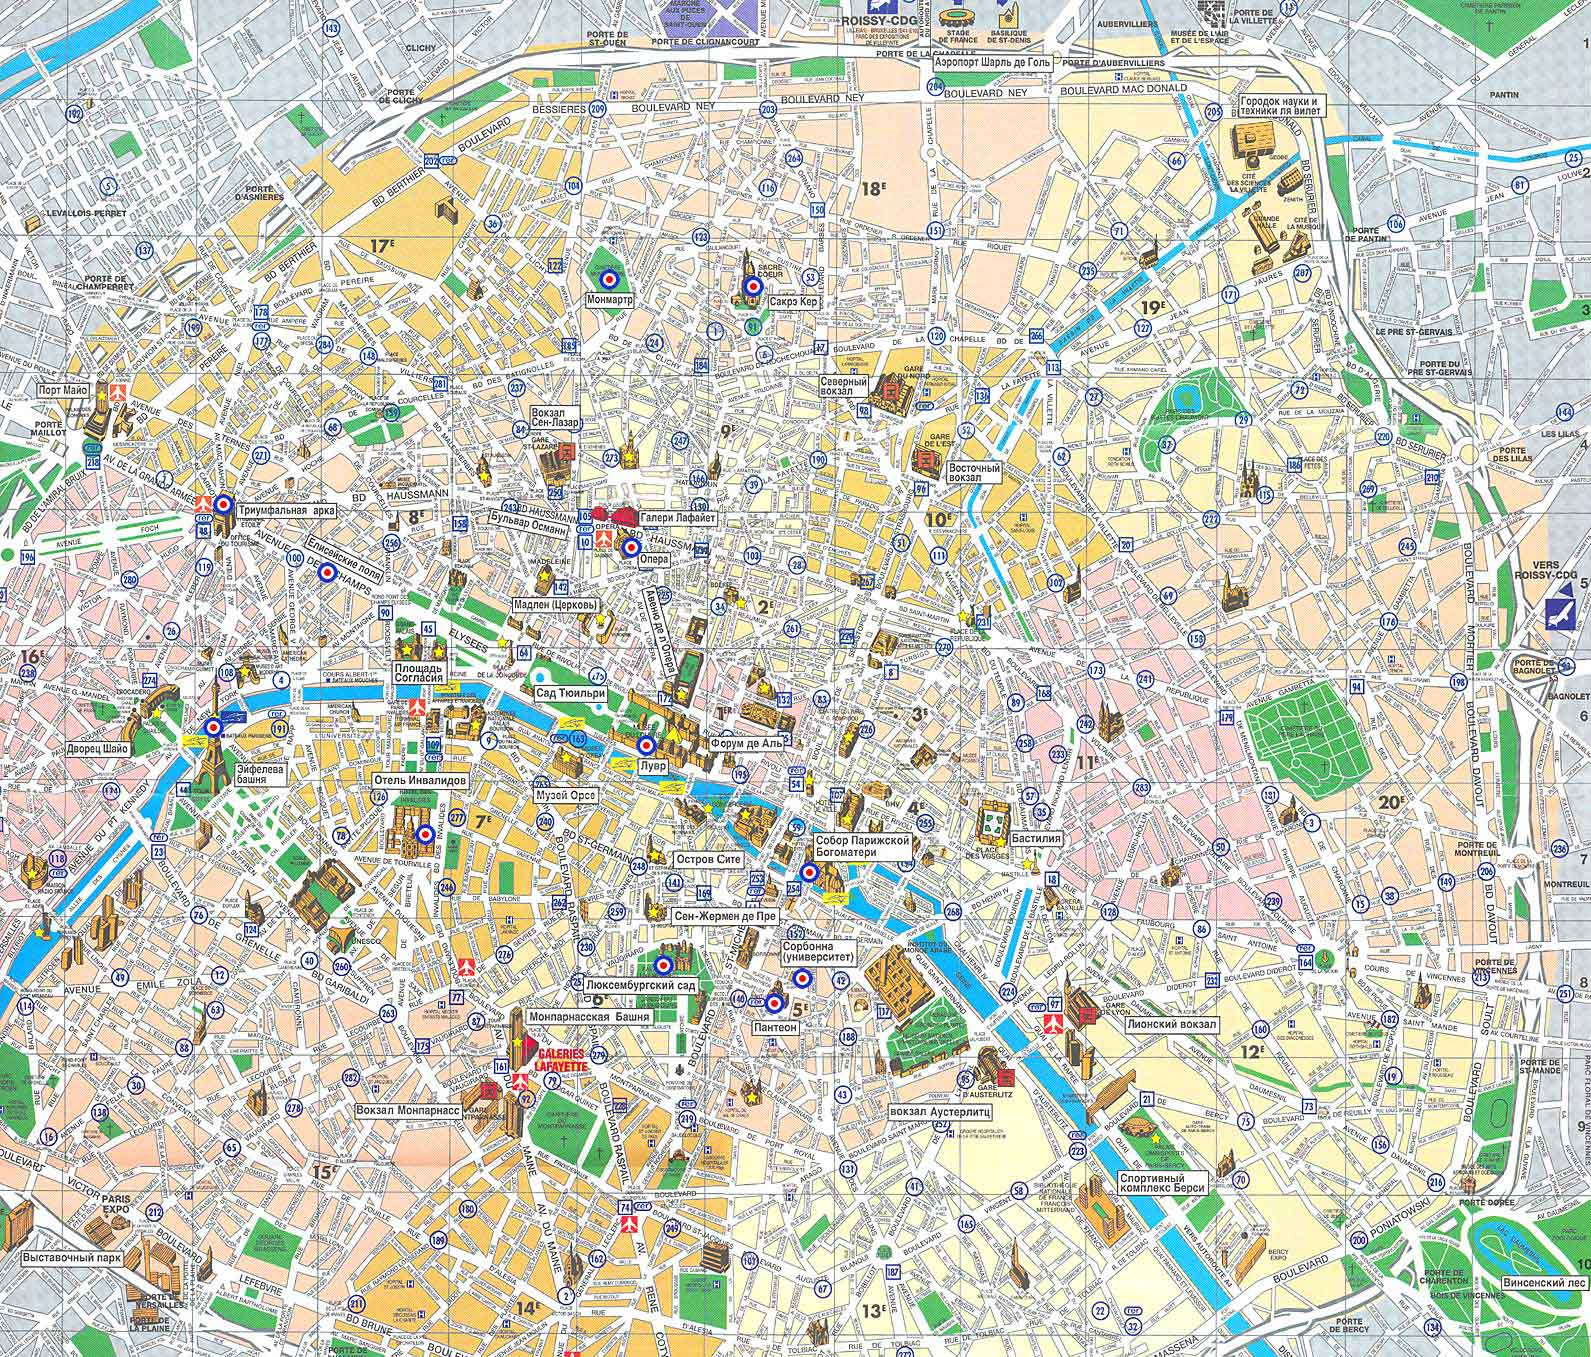 Paris Map - Detailed City And Metro Maps Of Paris For Download - Printable Map Of Paris